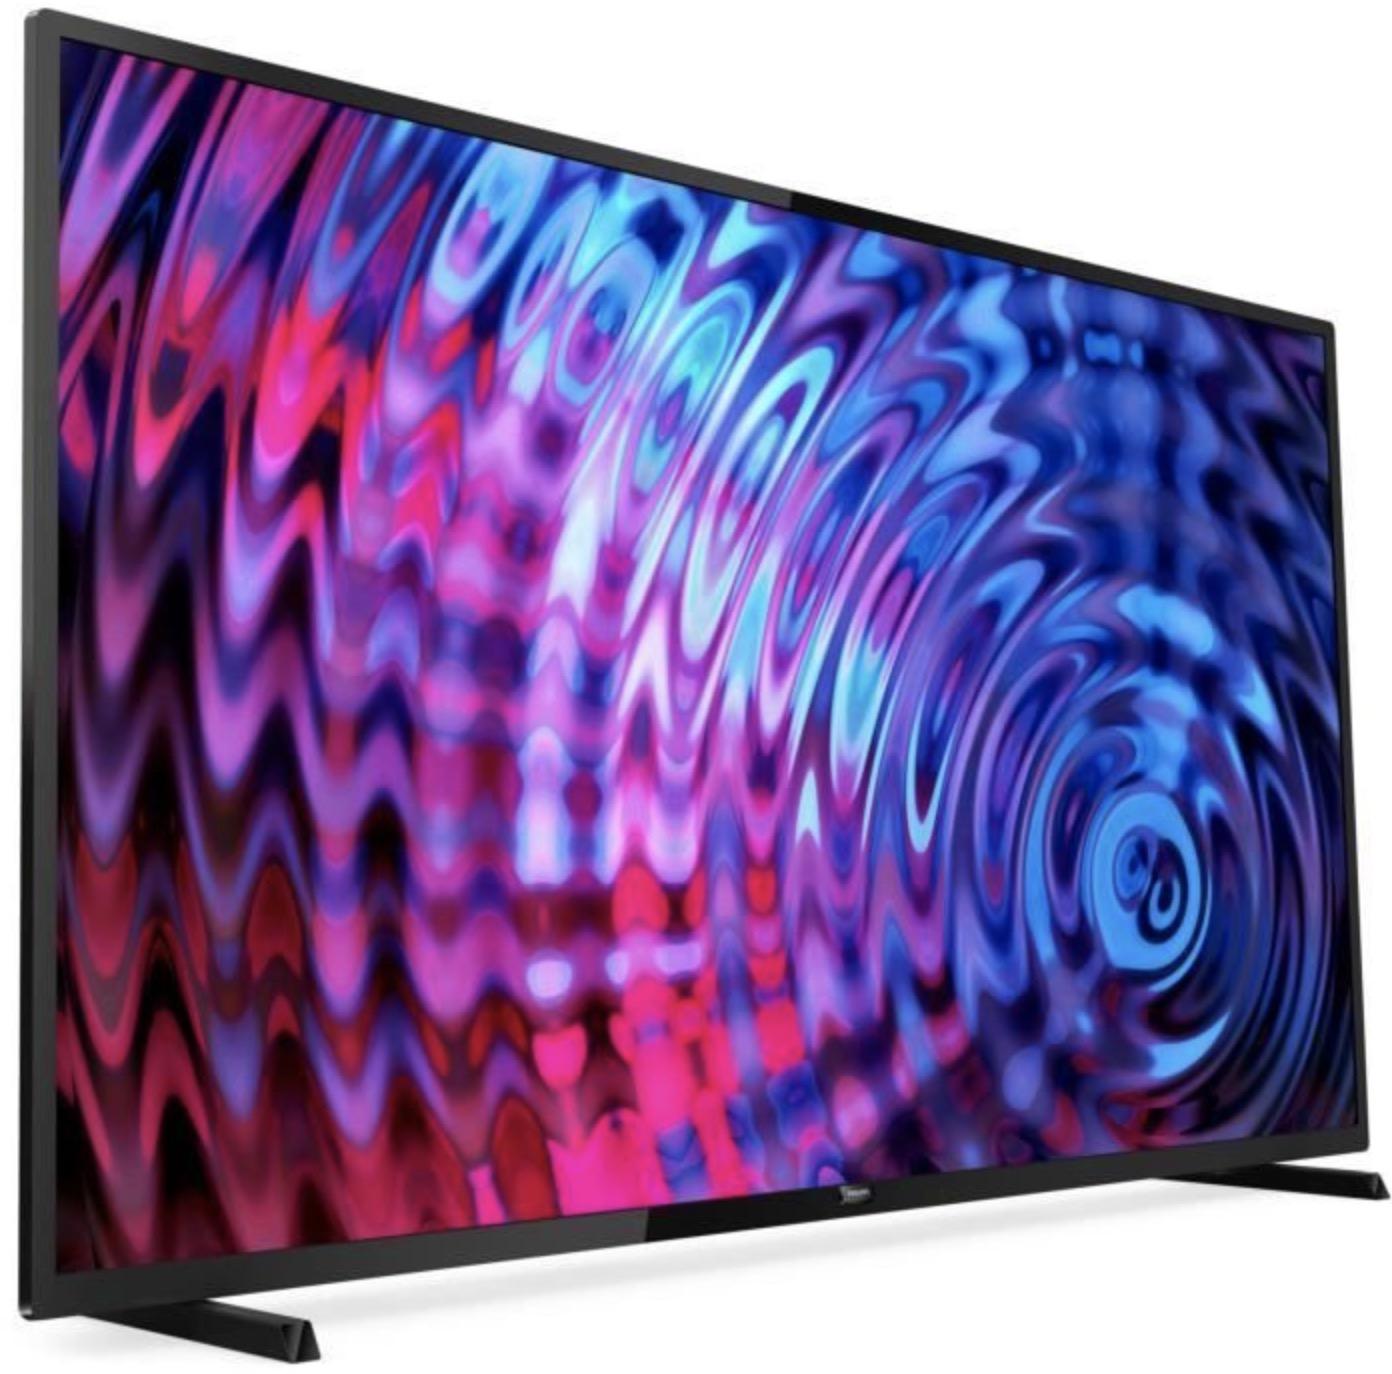 "Code promo Rakuten : Une TV Philips LED 43"" à gagner"